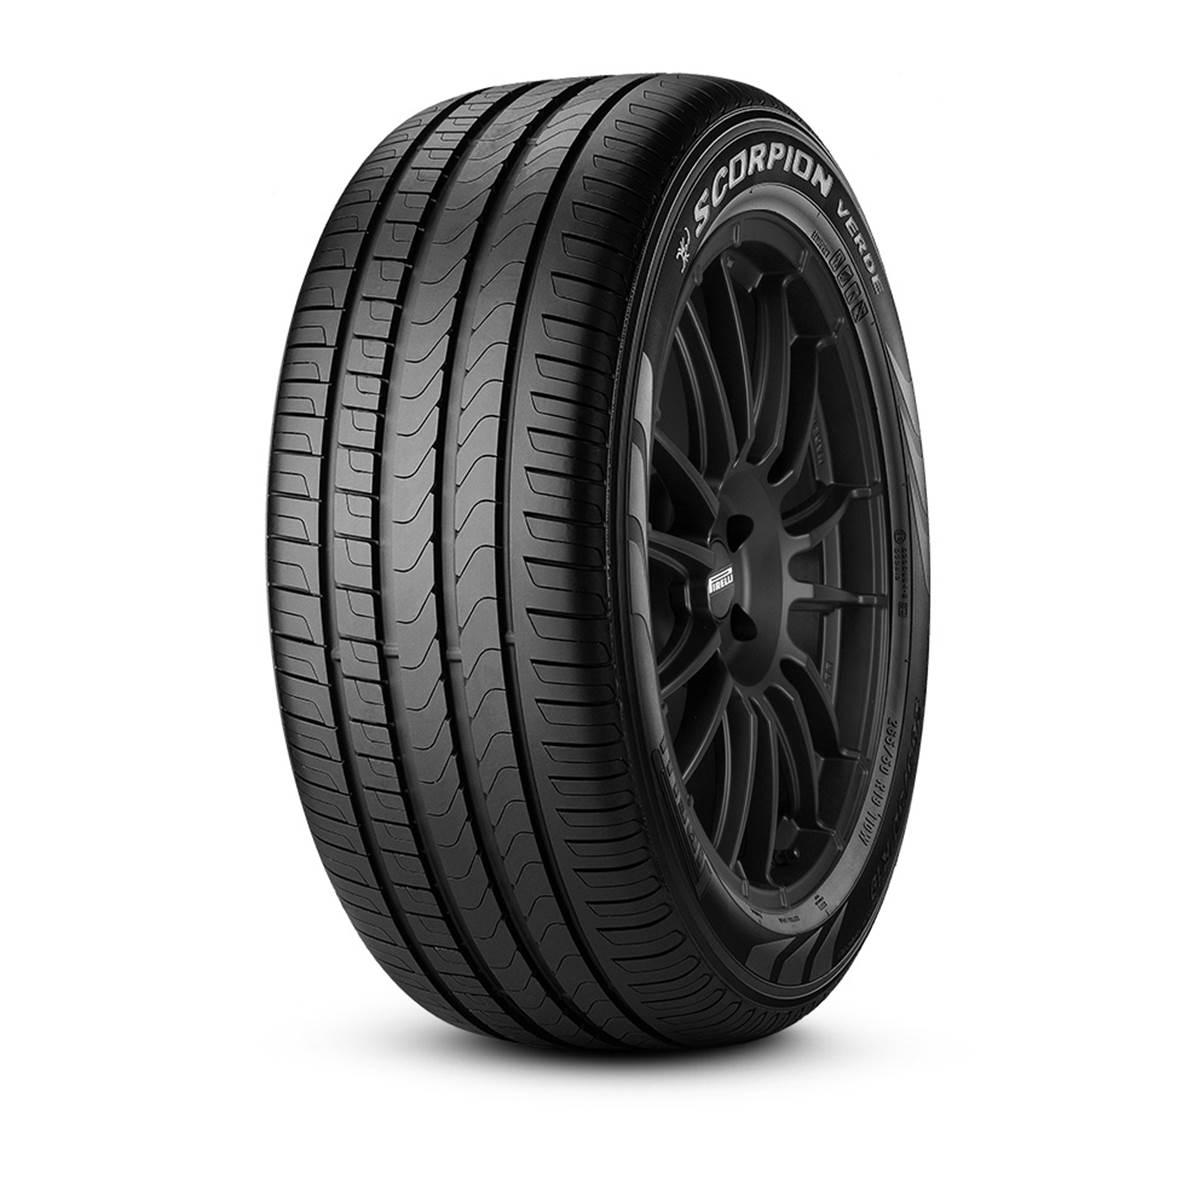 Pneu 4X4 Pirelli 275/50R20 109W Scorpion Verde homologué Mercedes